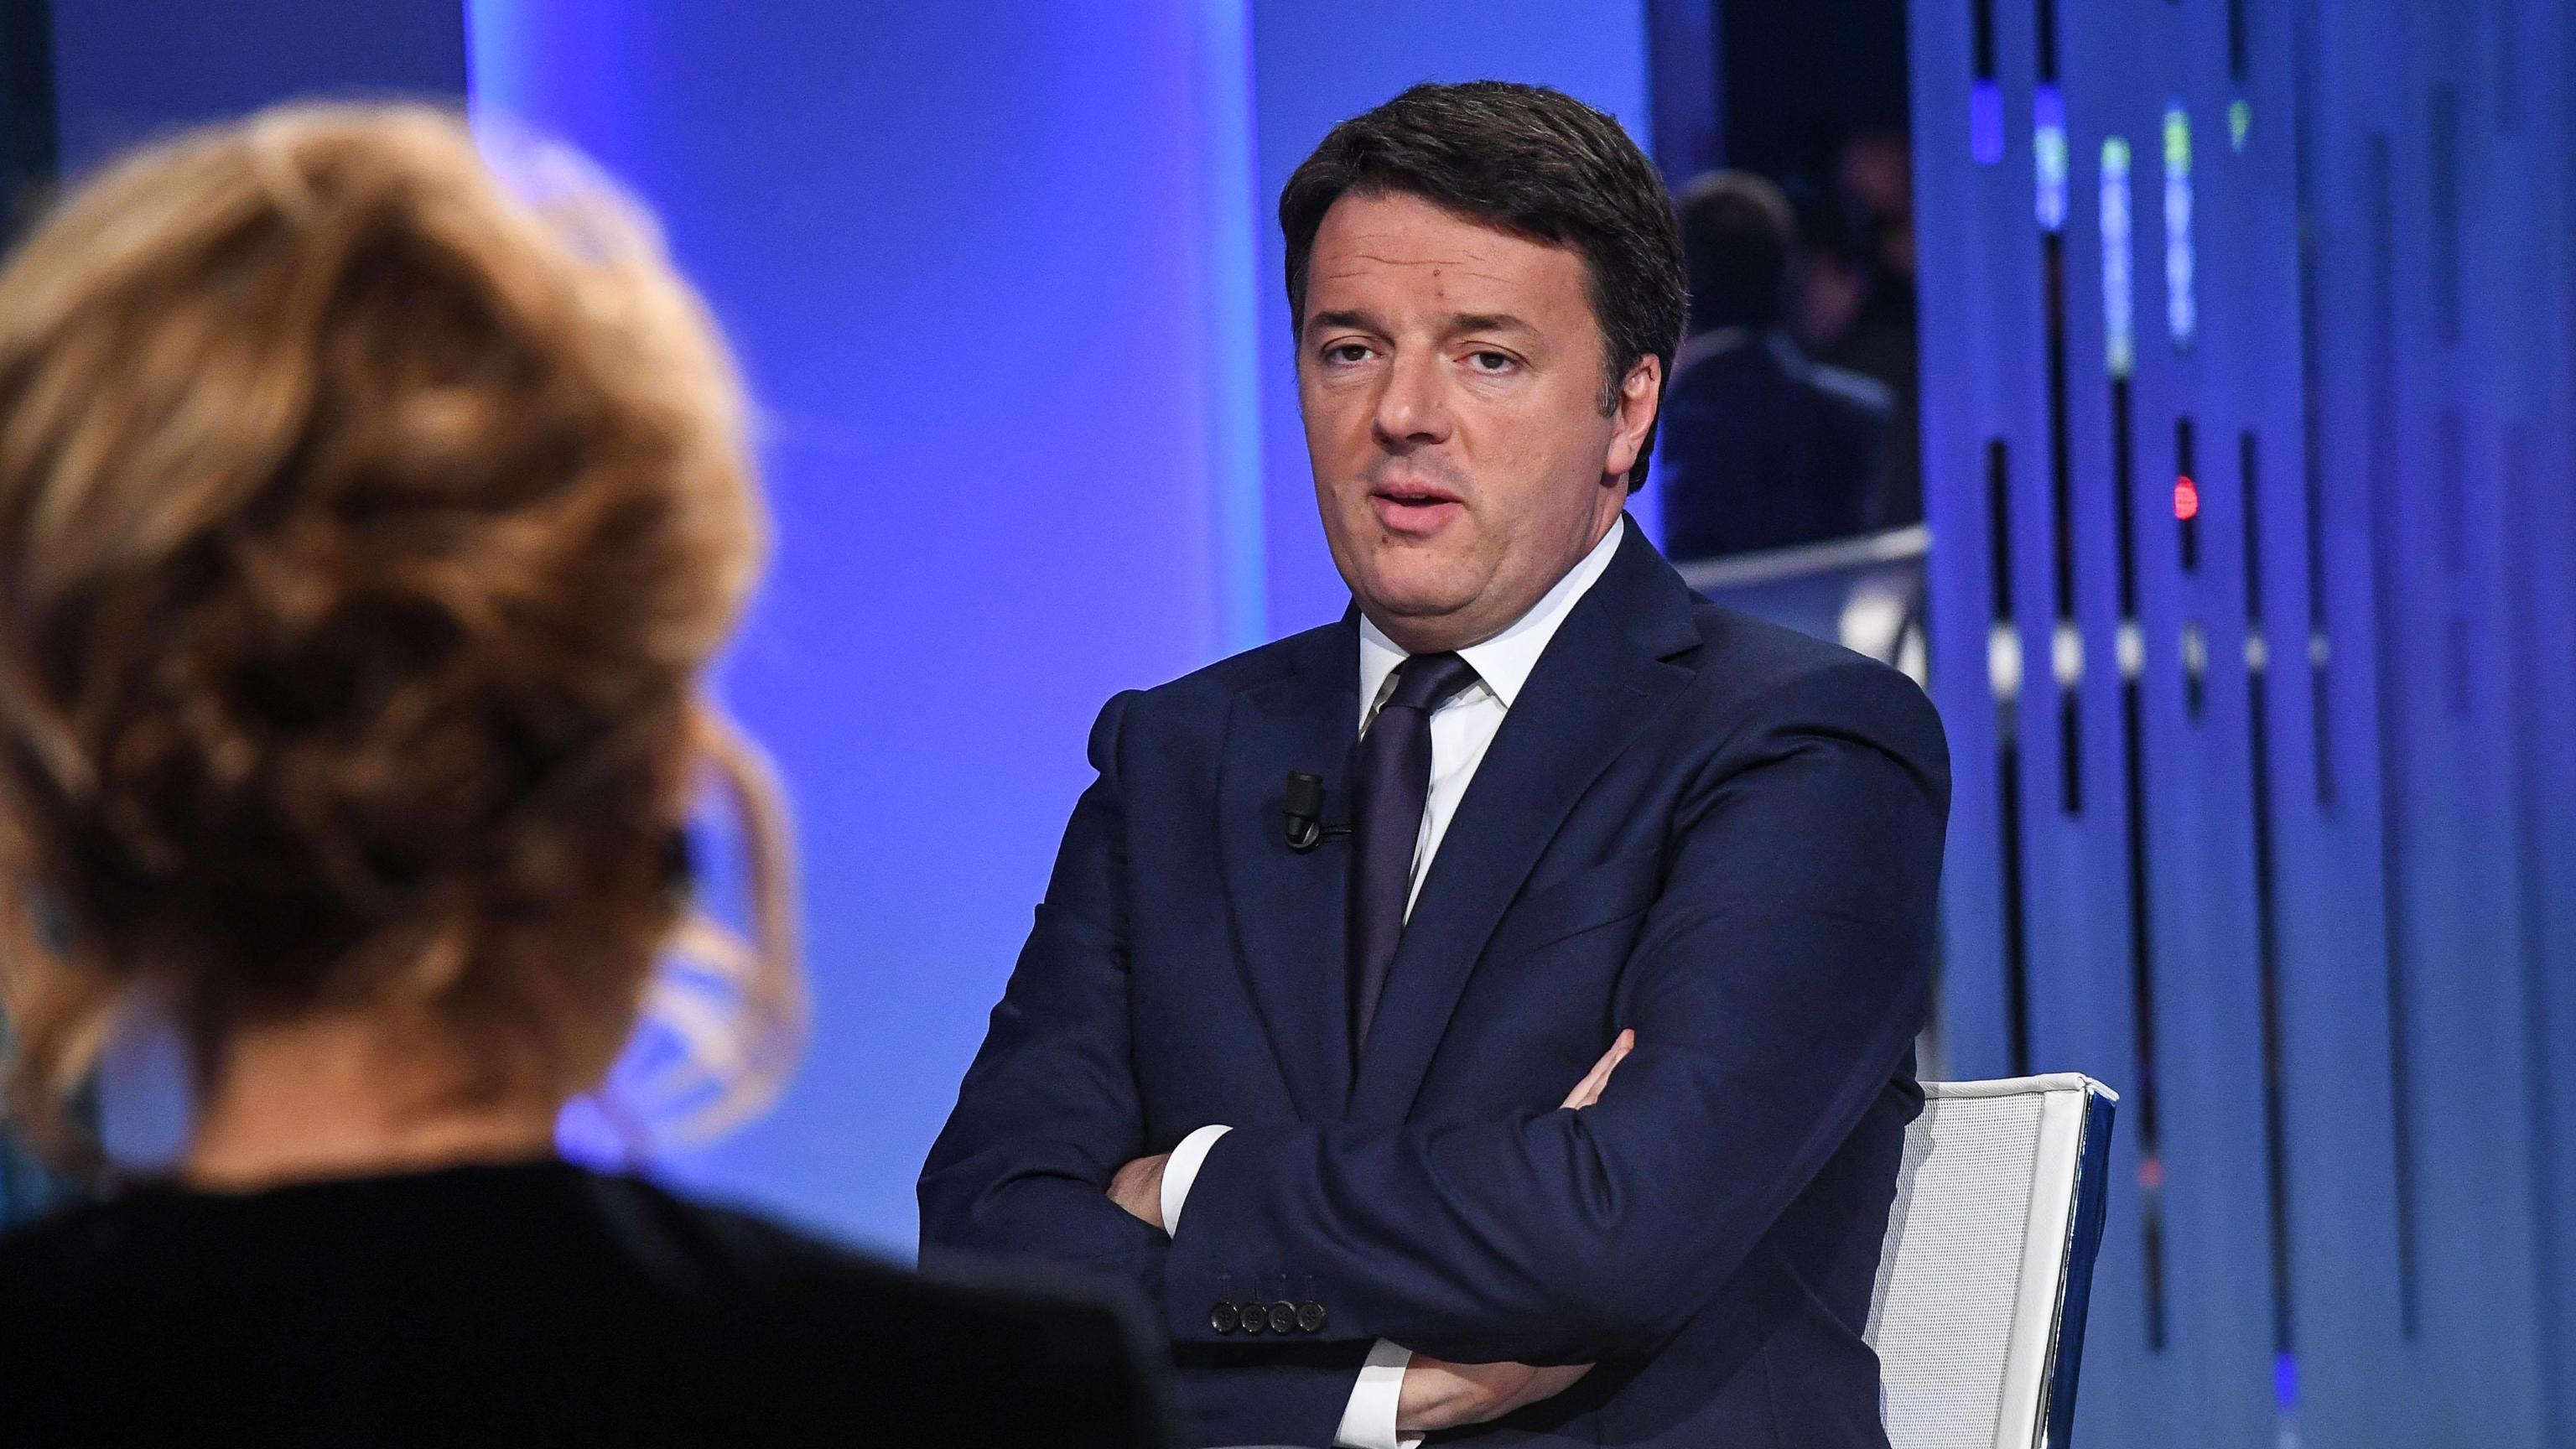 Renzi incontra segretari locali su liste